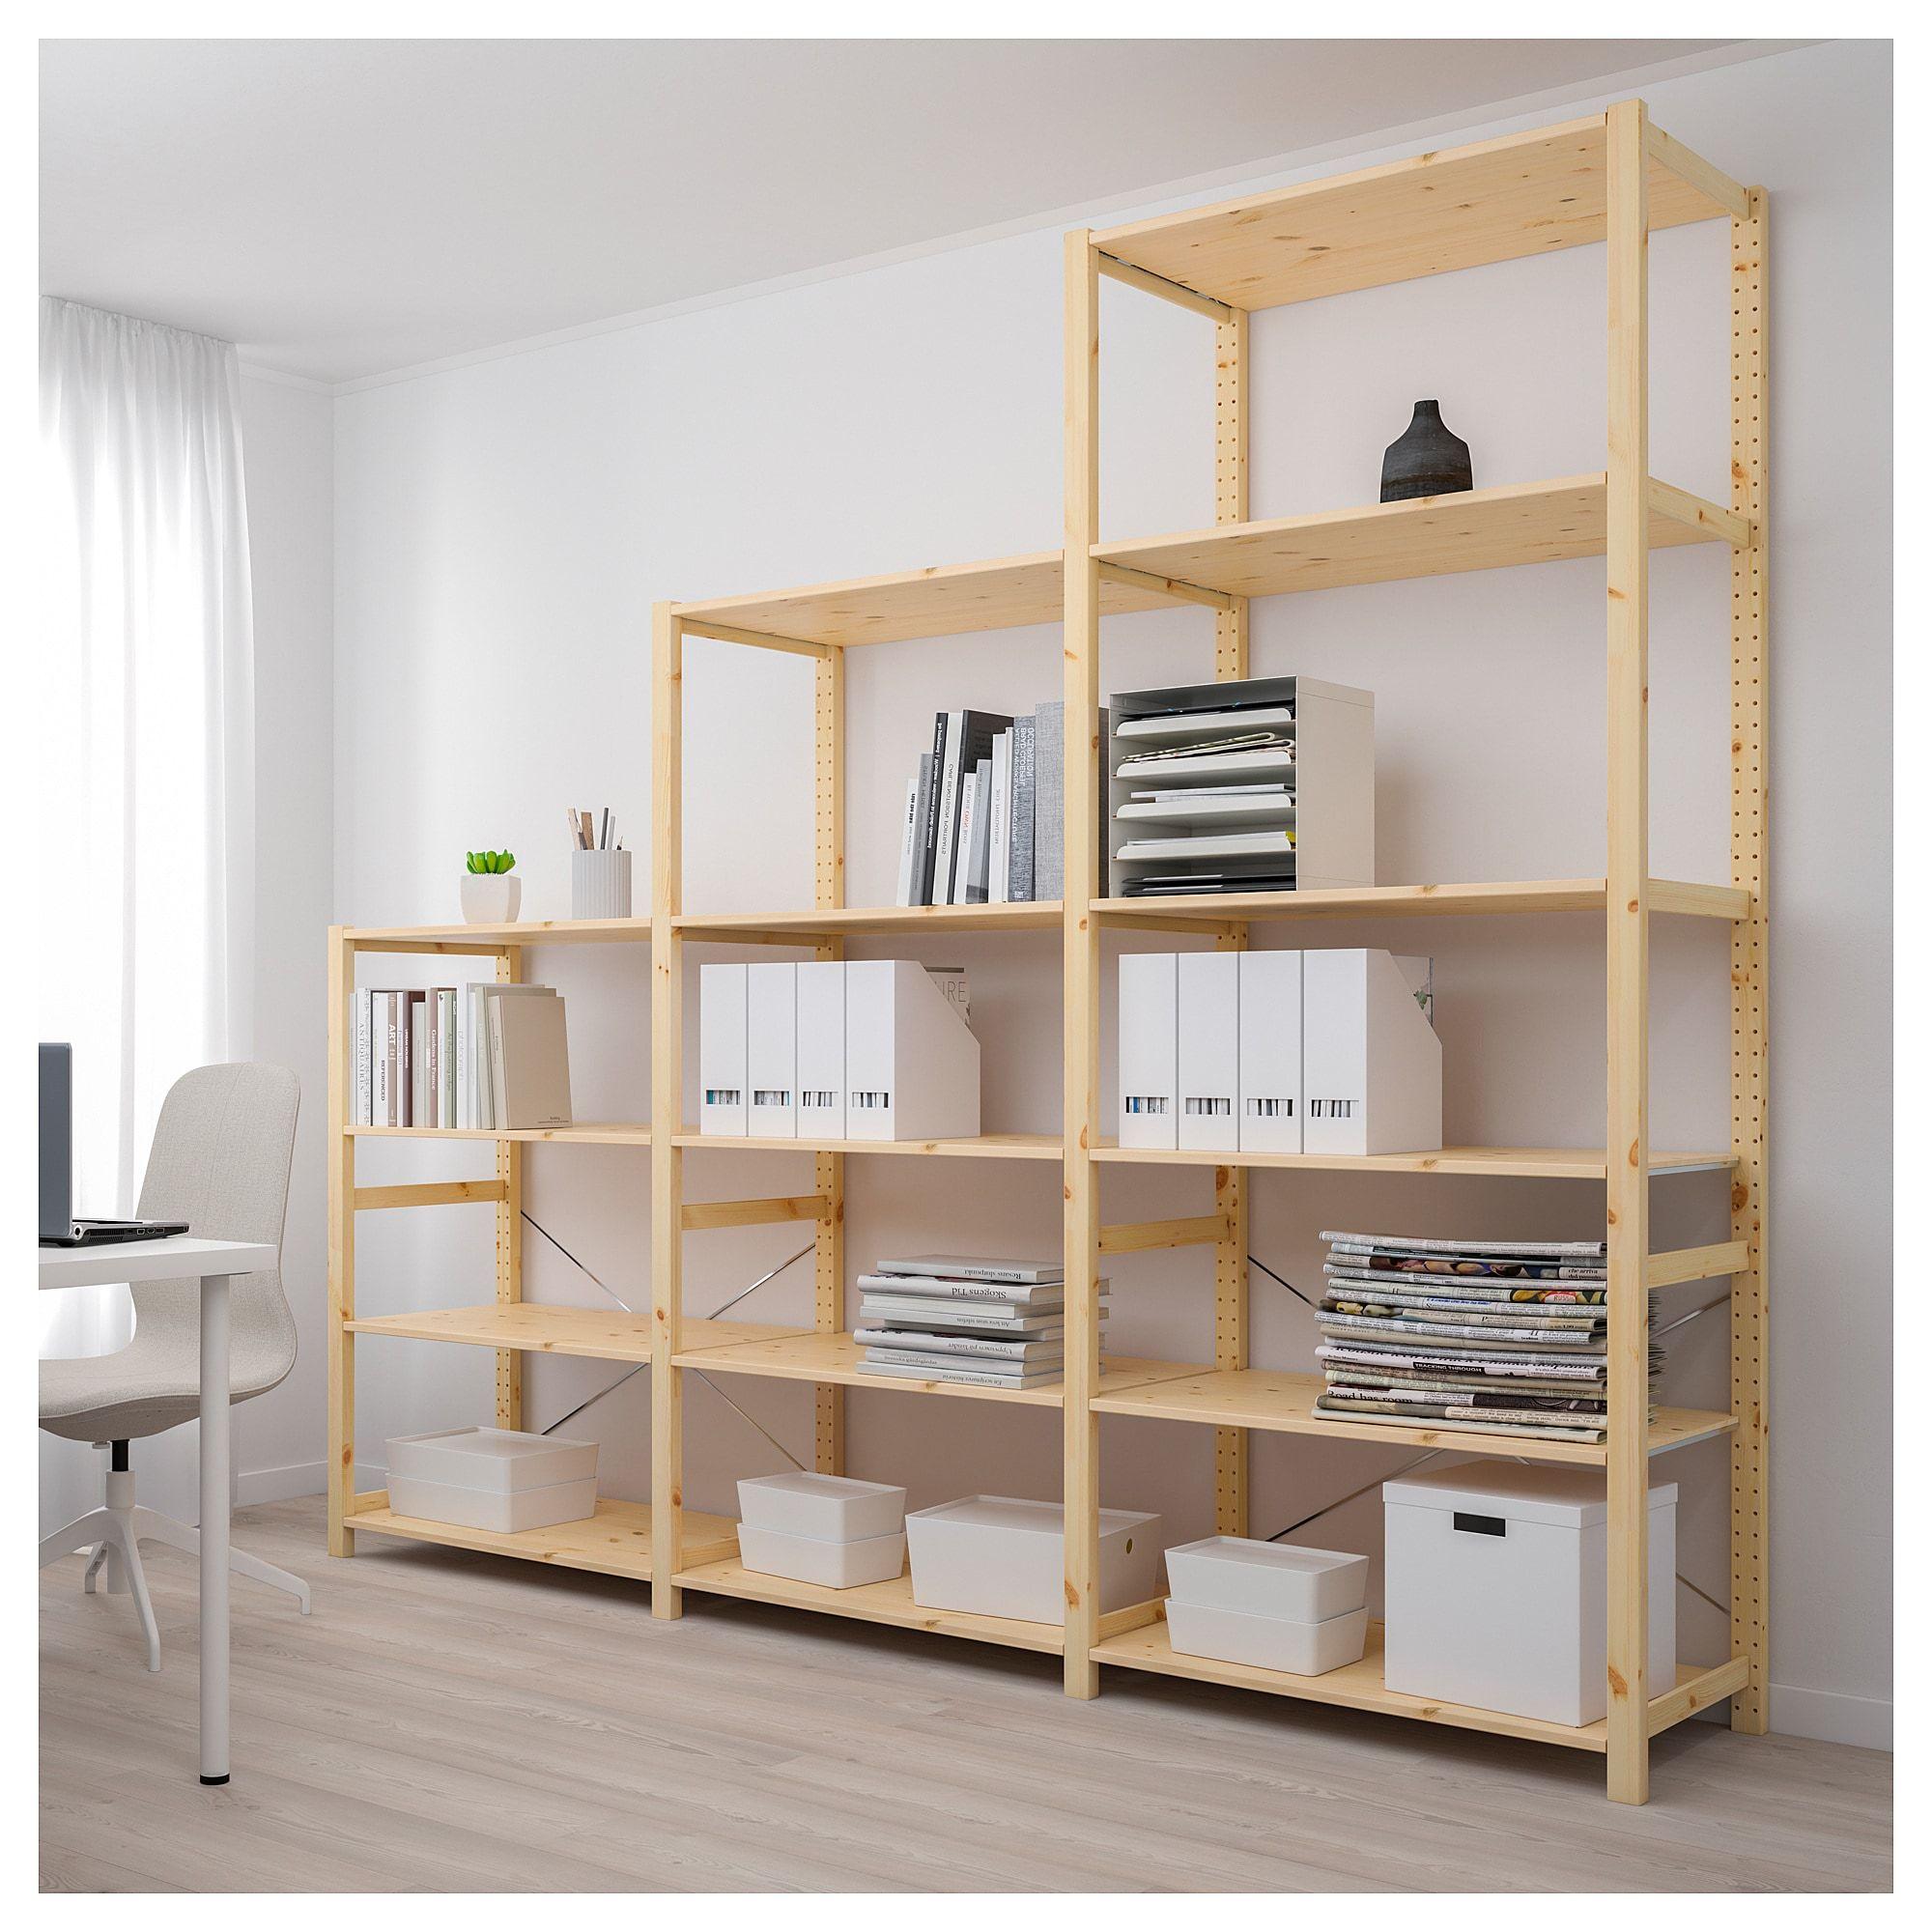 Ivar Pine 3 Sections Shelves 259 X50 X226 Cm Ikea Shelving Unit Ikea Ivar Ikea Wall Shelves